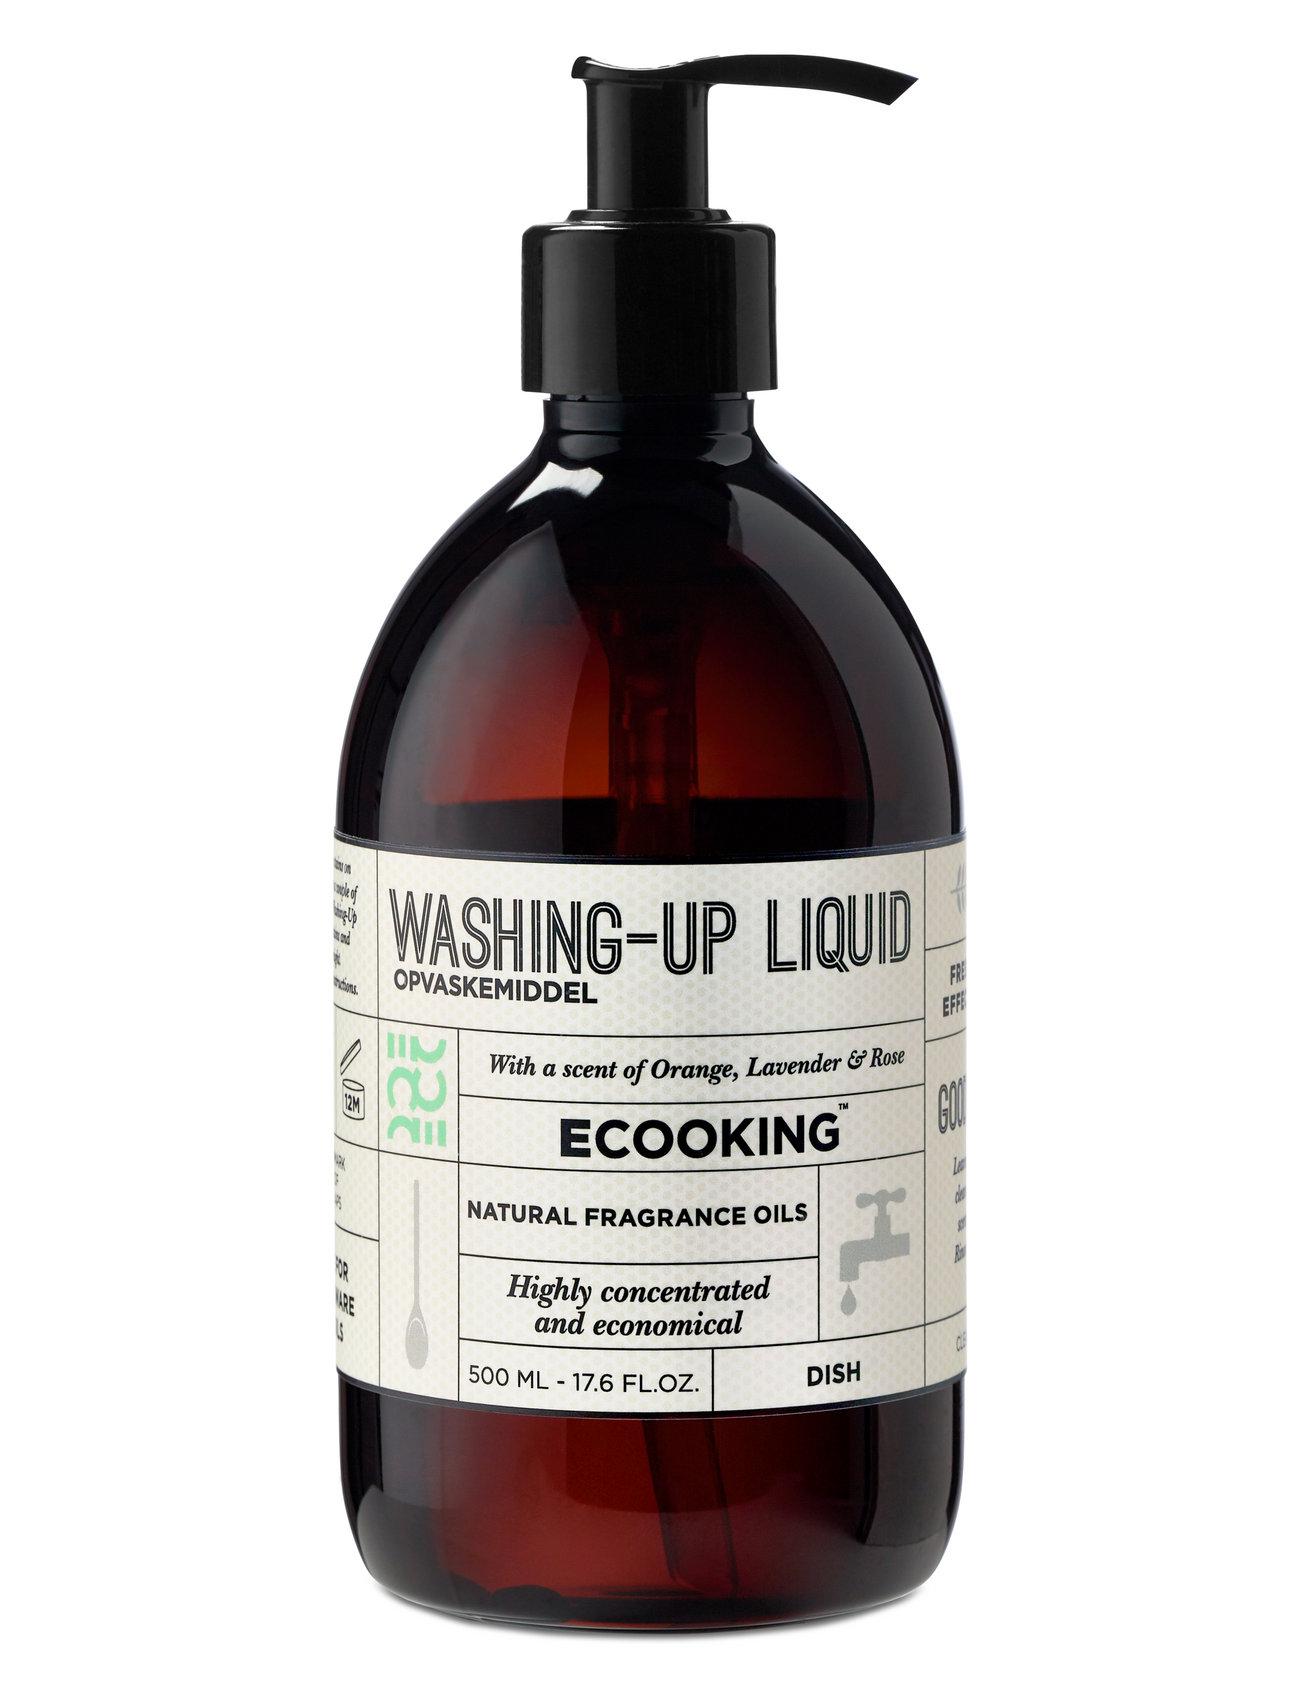 Image of Washing-Up Liquid Håndsæbe Nude Ecooking (3416356155)